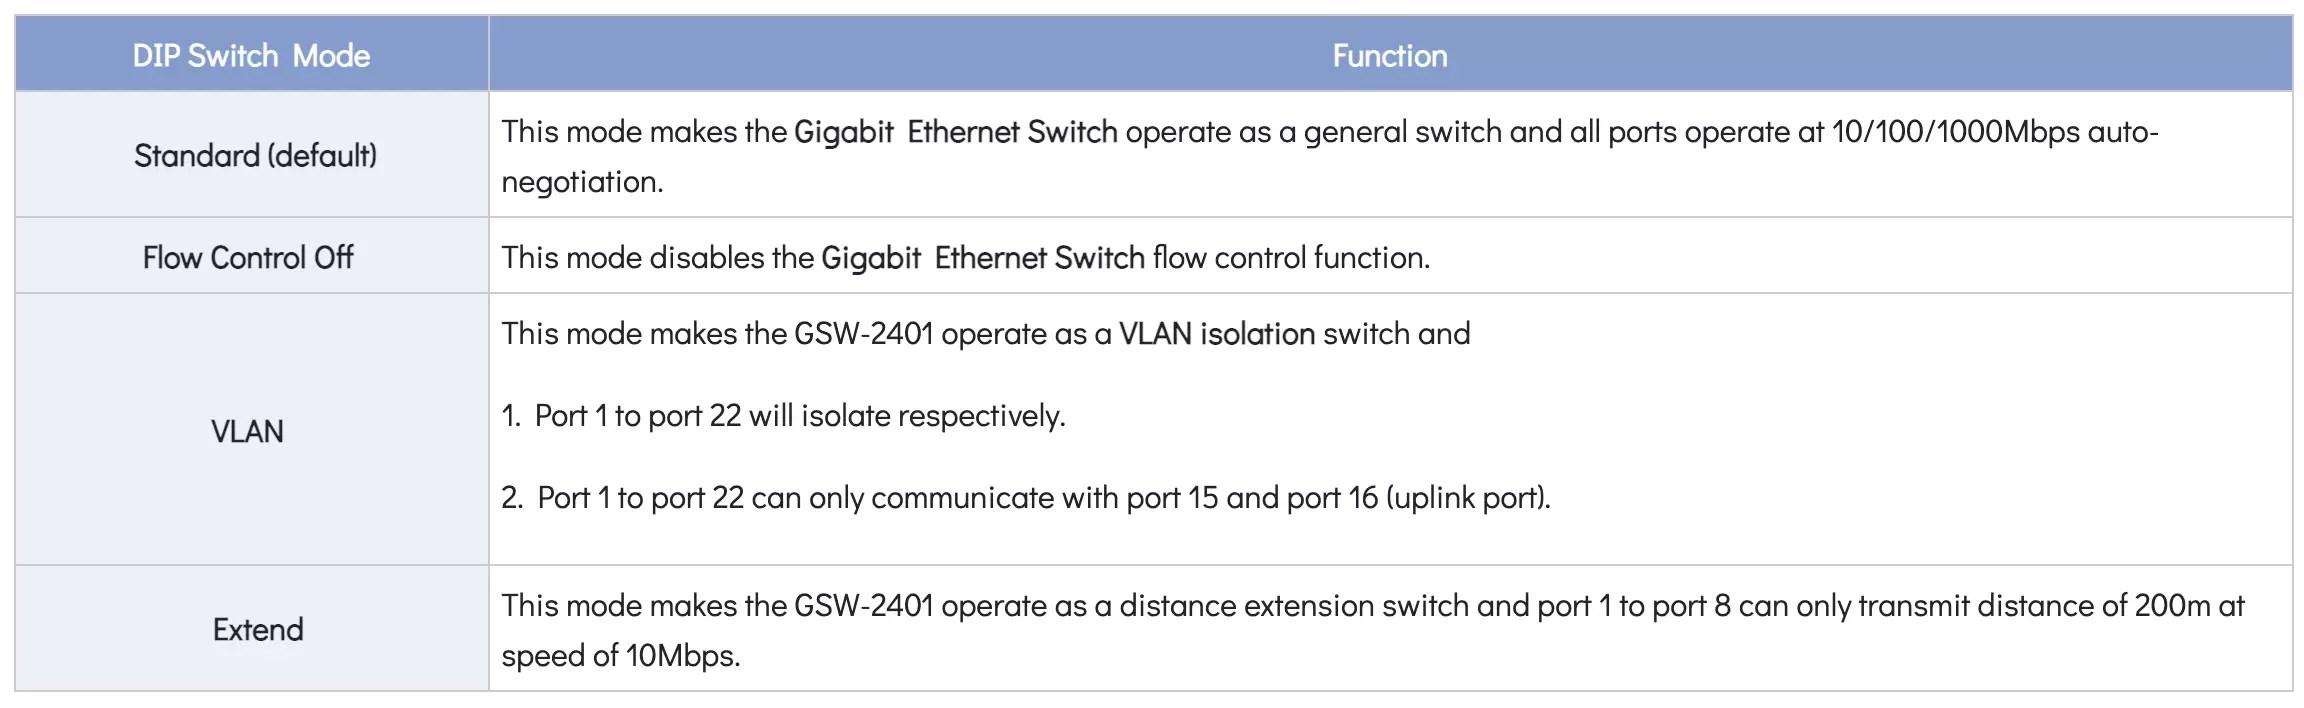 GSW-2401 DIP Switch Mode Chart